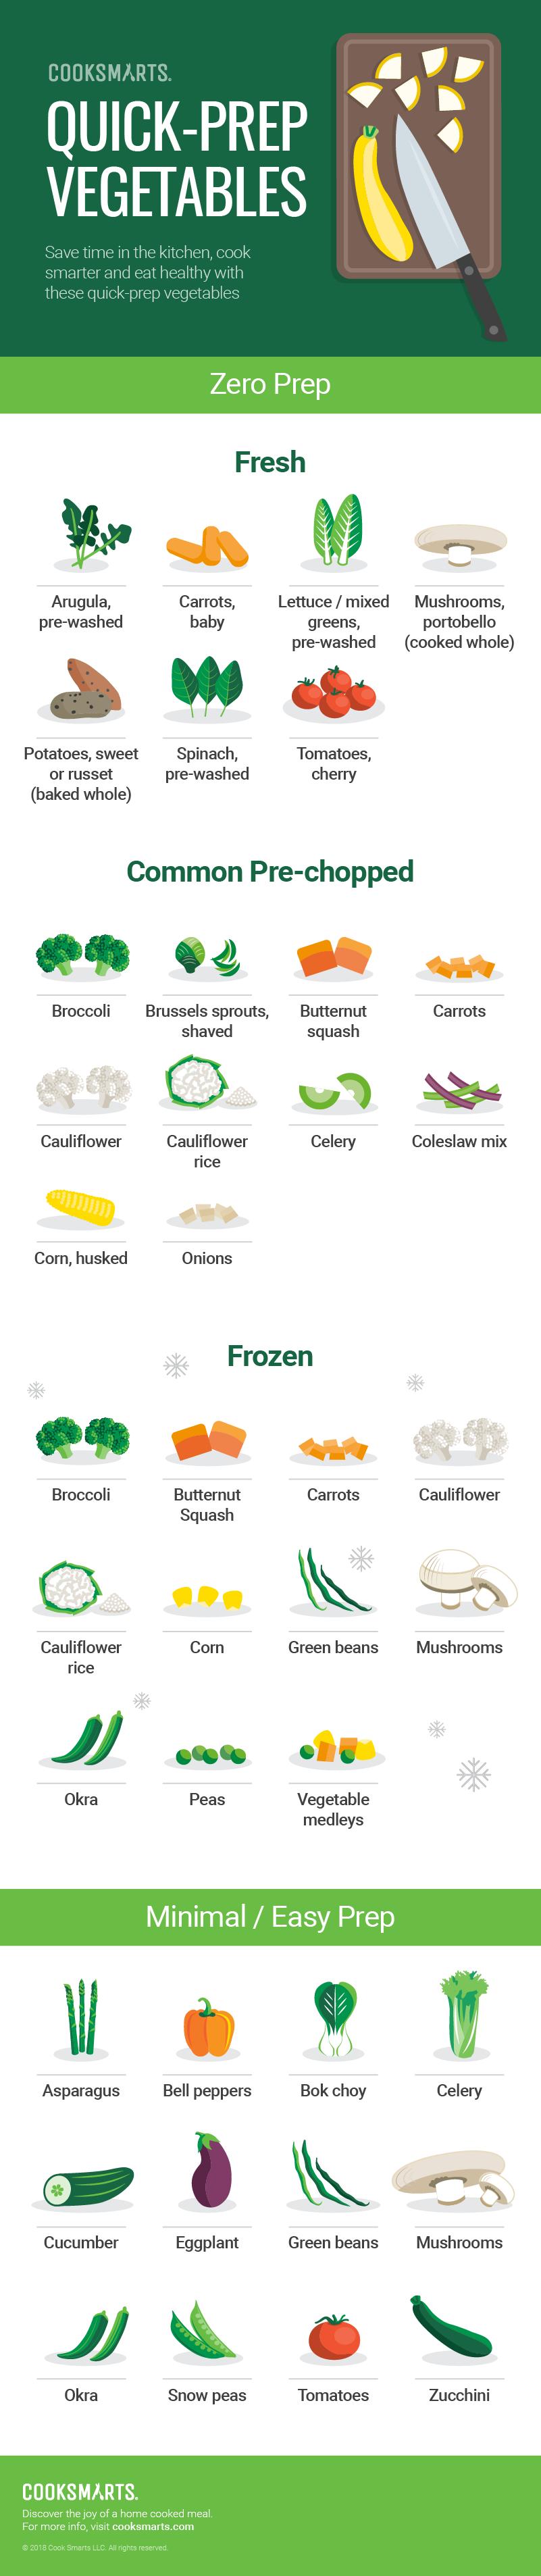 Cook Smarts' List Of Quick-Prep Vegetables